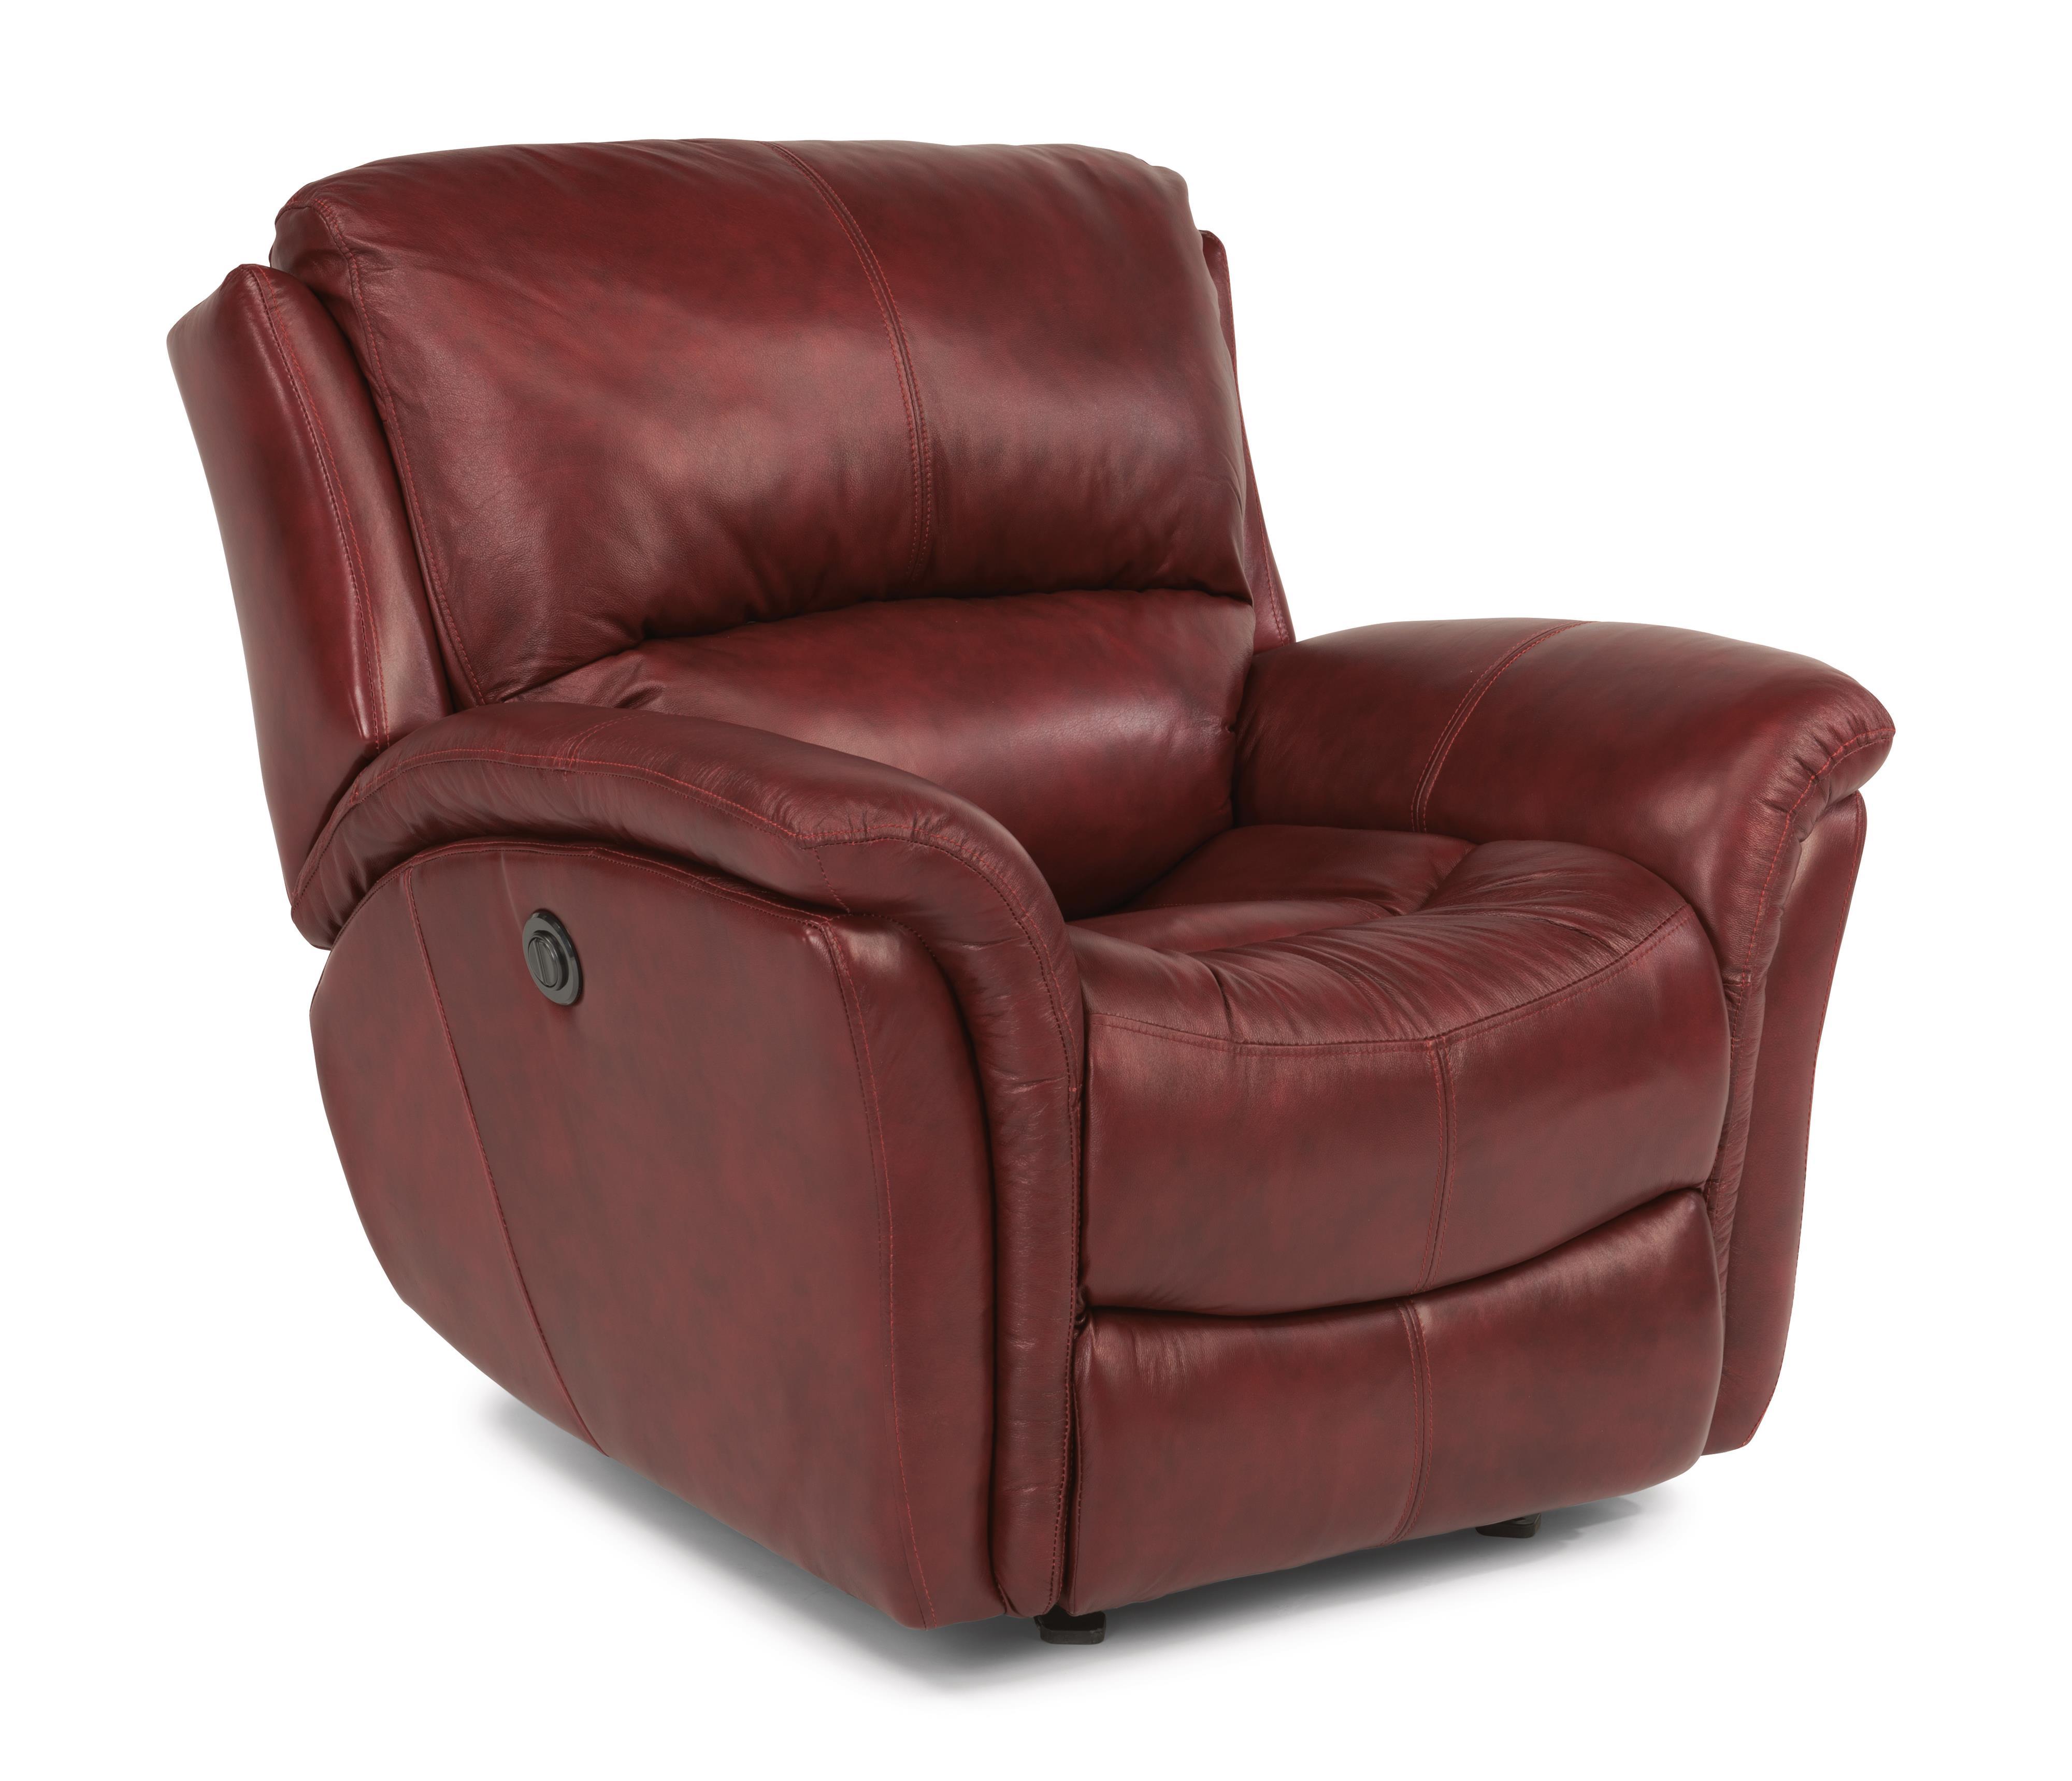 best chairs geneva glider weight limit outdoor flexsteel latitudes dominique casual recliner